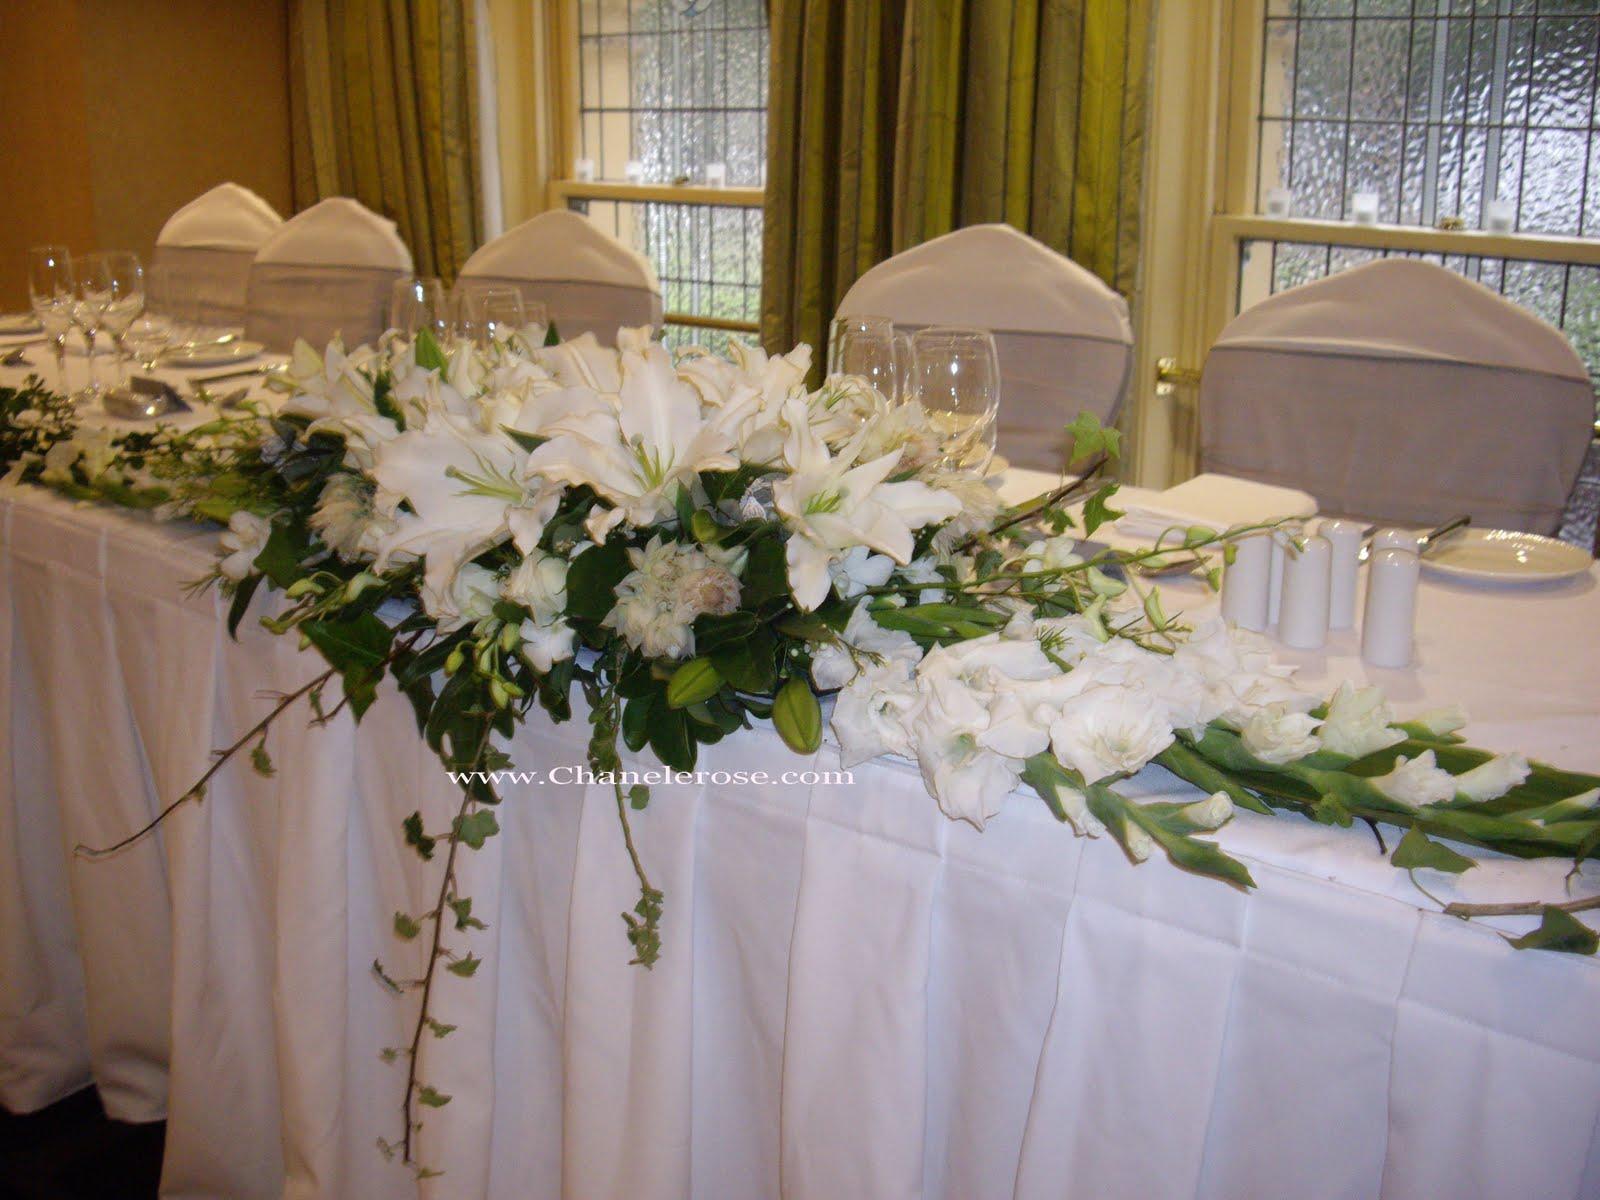 Lollis blog wedding table decorations junglespirit Gallery